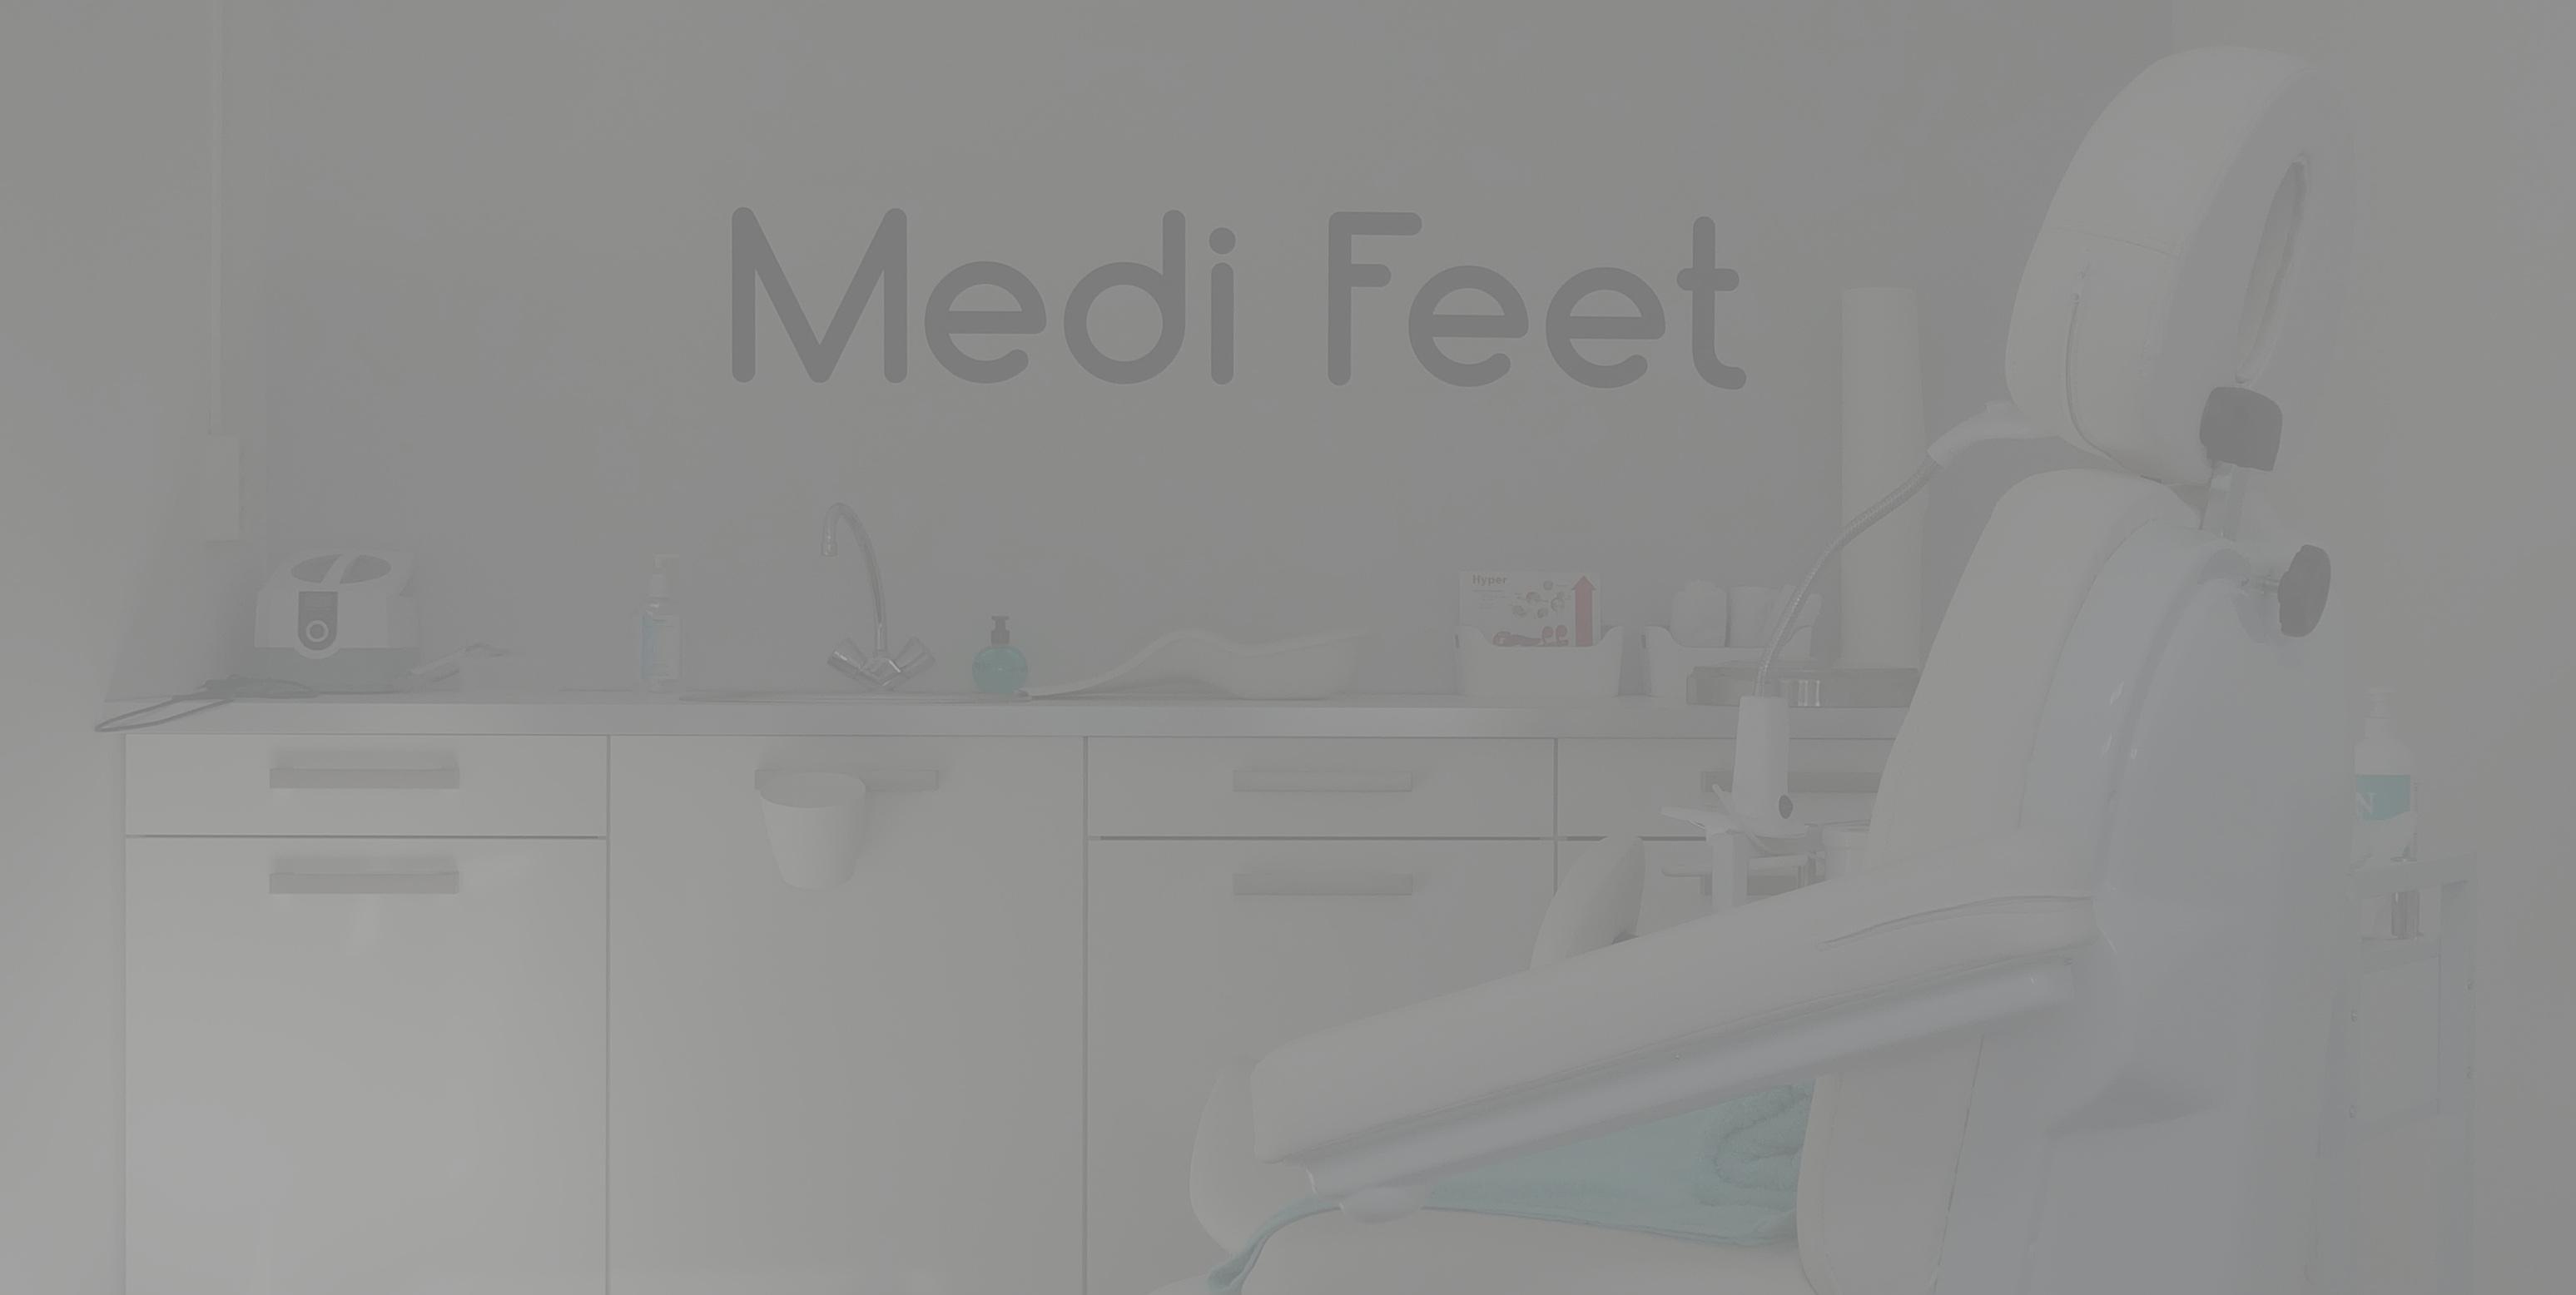 Welkom bij Praktijk Medi Feet